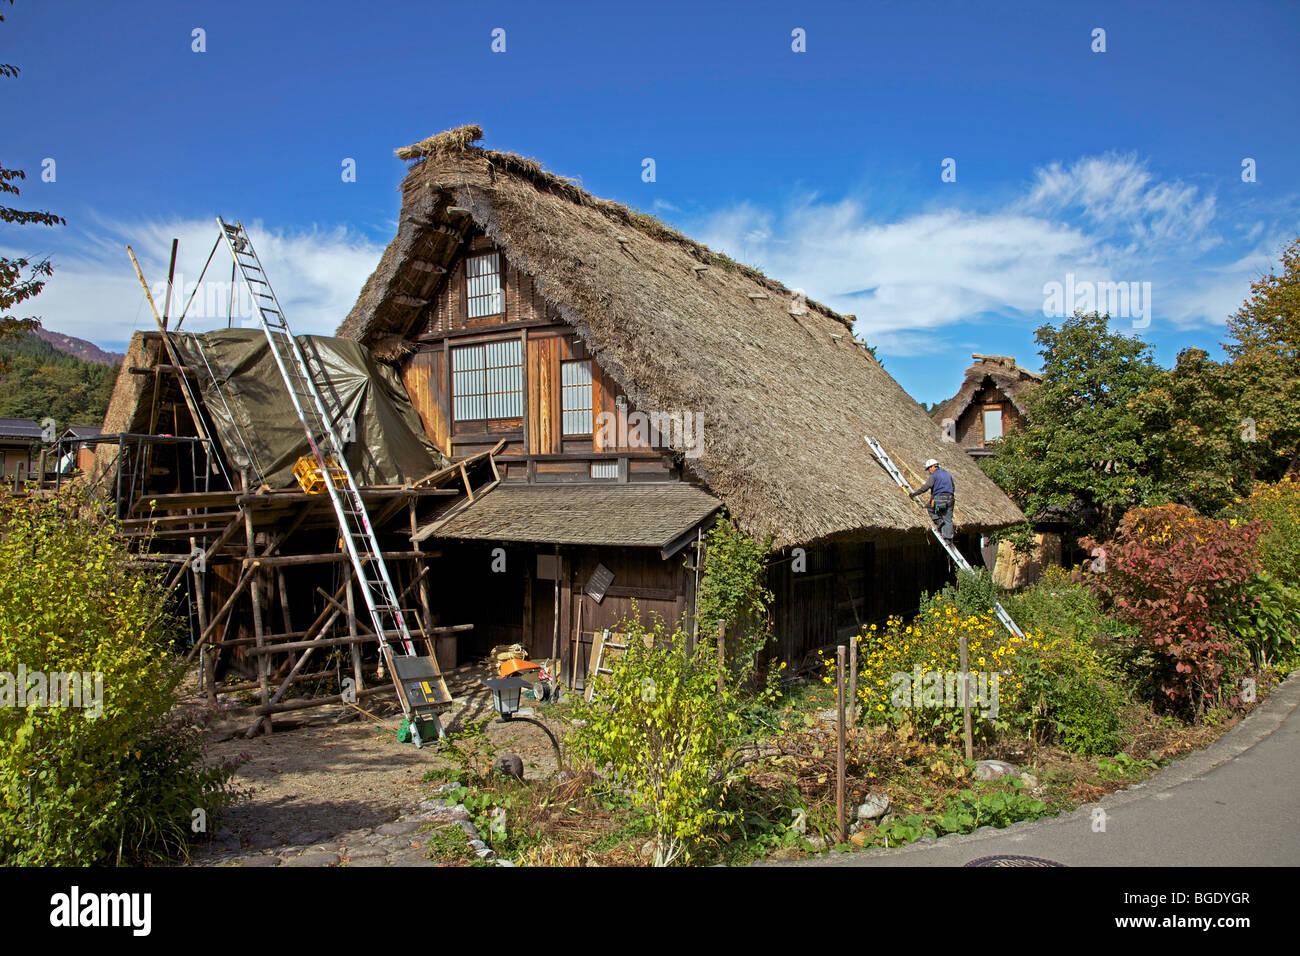 Re-thatching traditional thatched farmhouse at Shirakawa Go village, Gifu Prefecture, Japan - Stock Image